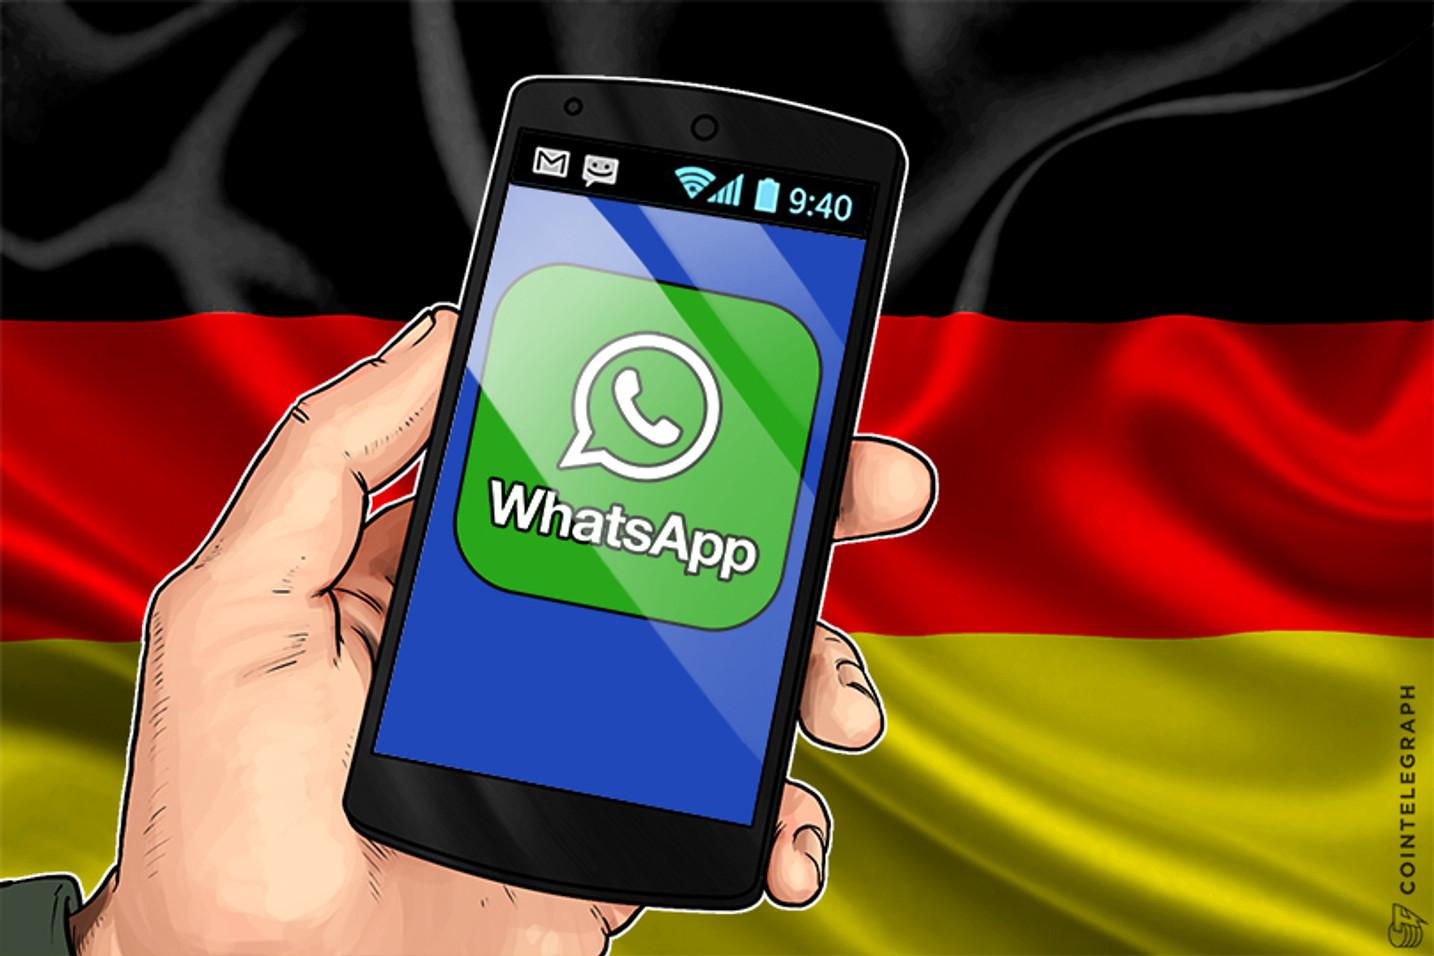 War Against Encryption: German Intelligence Agency Targets WhatsApp, Telegram